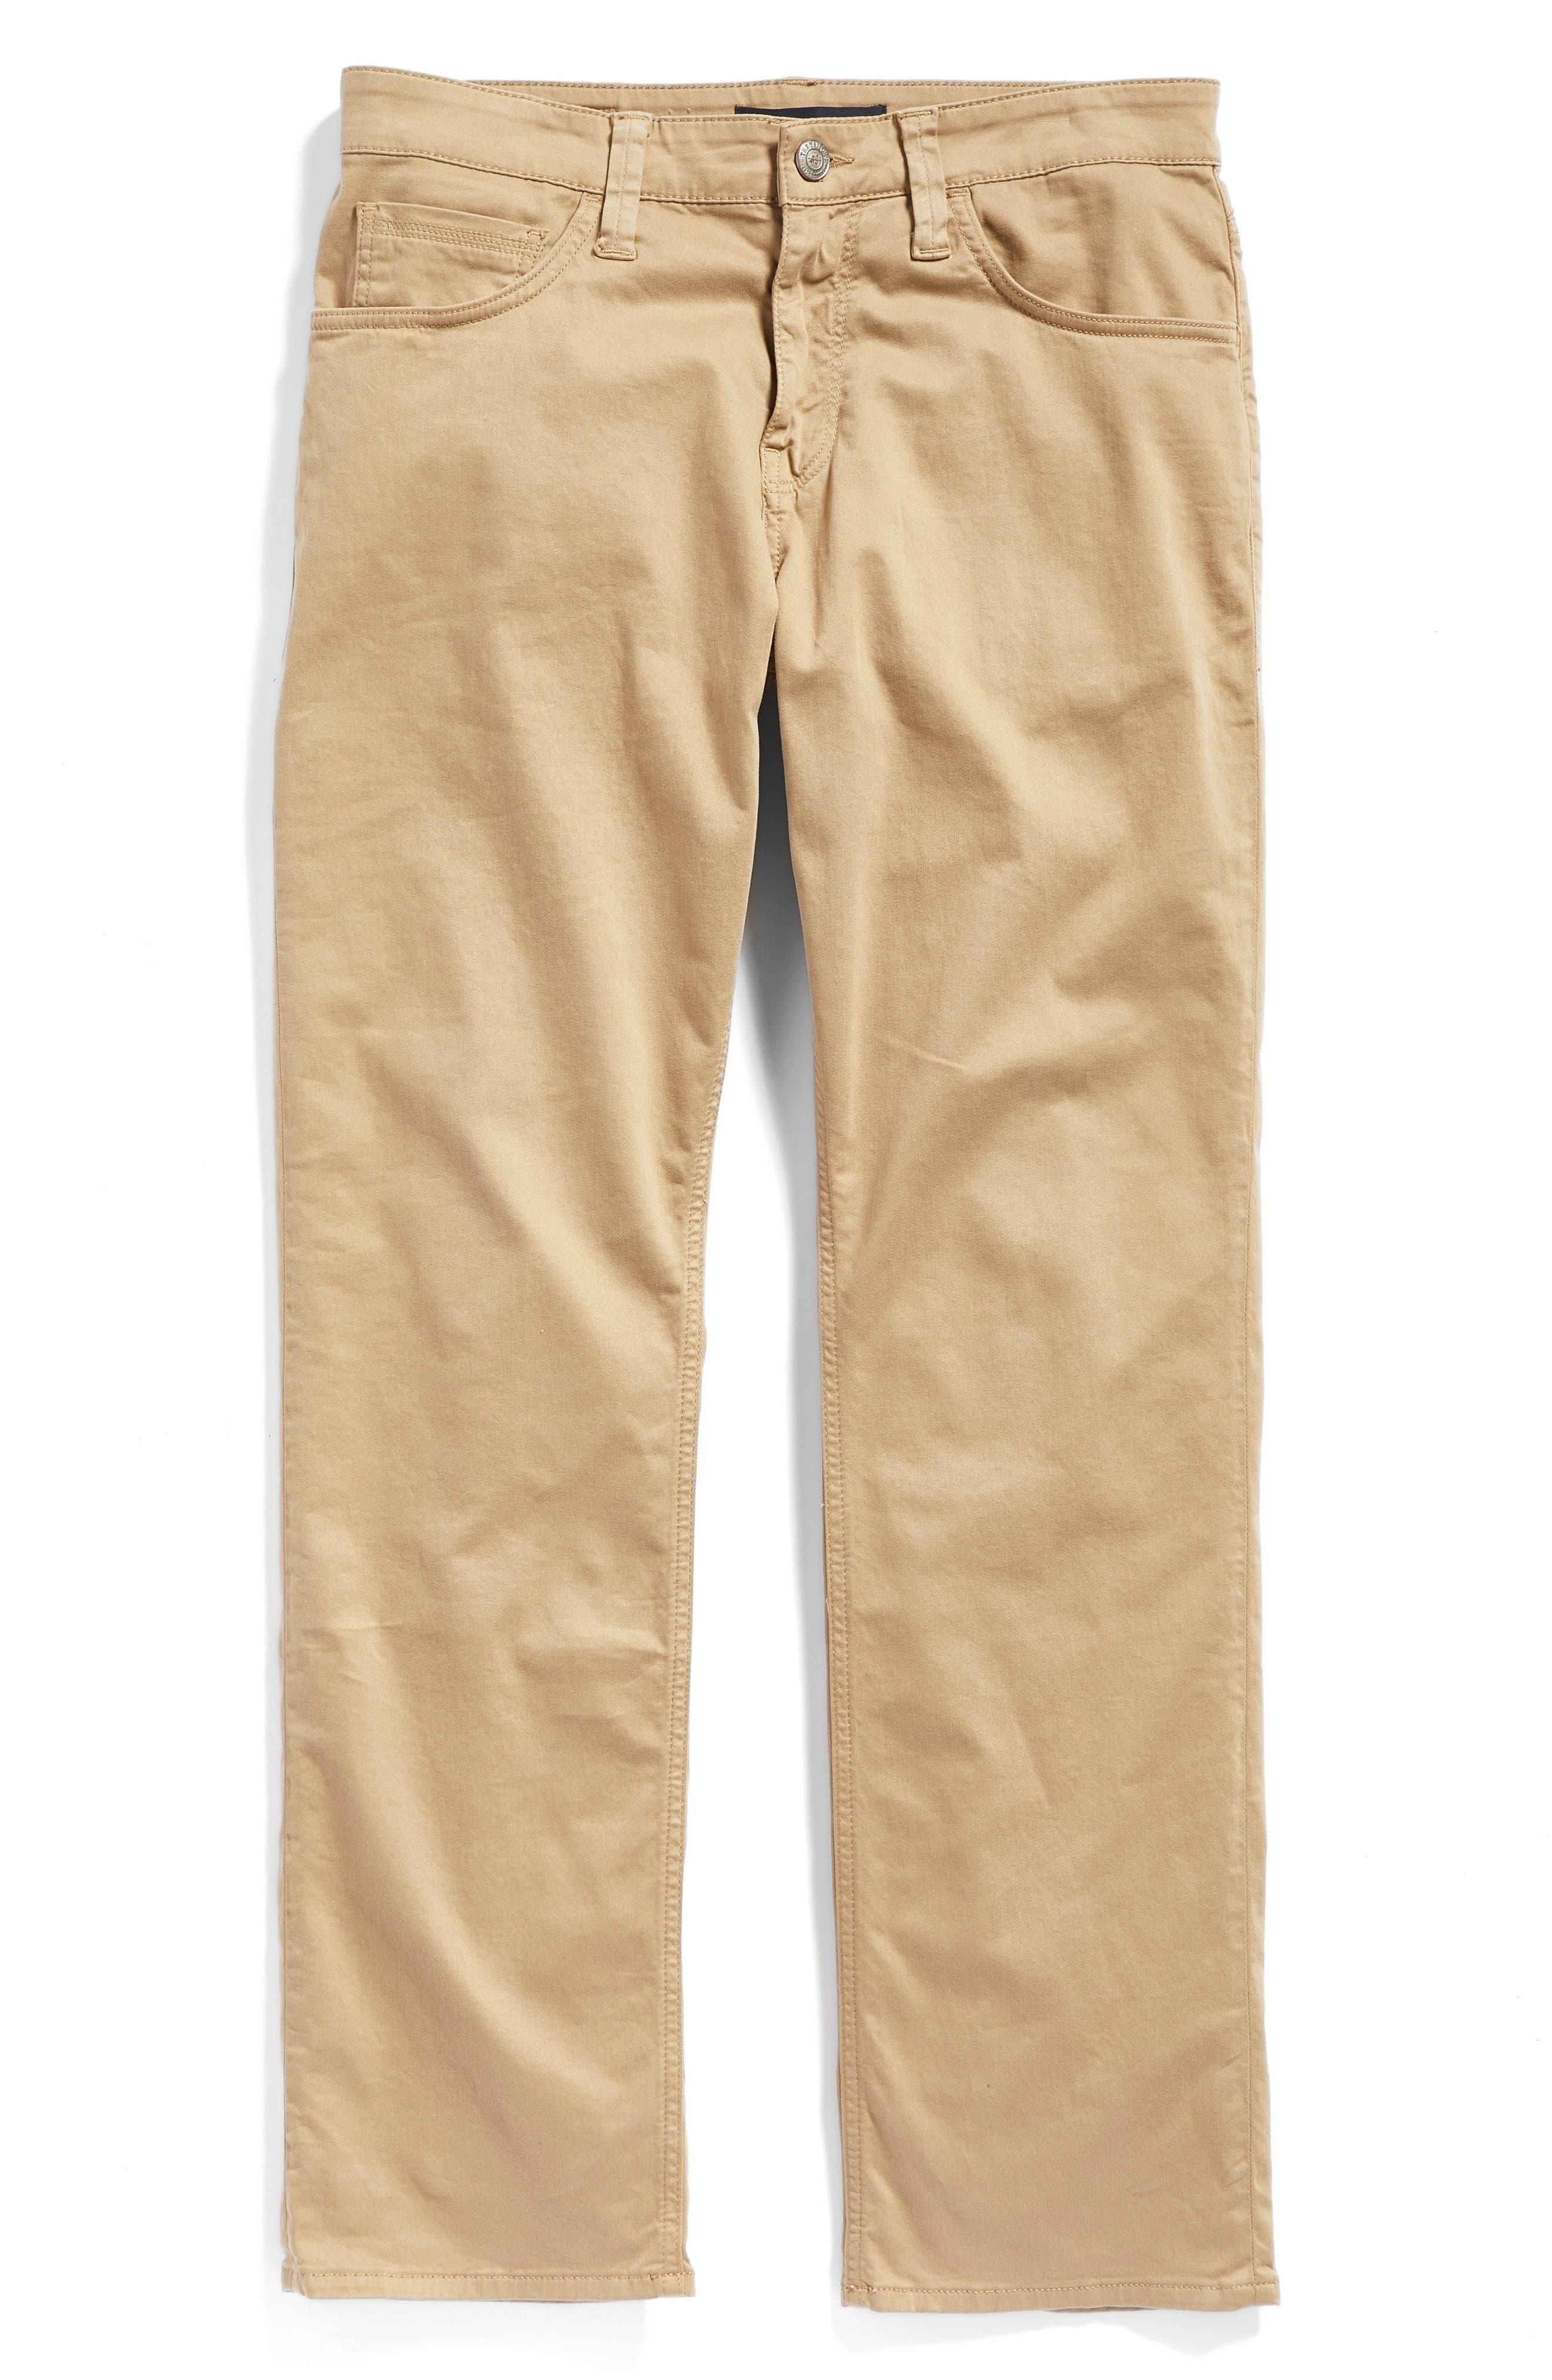 Matt Relaxed Fit Jeans,                             Alternate thumbnail 6, color,                             British Khaki Twill